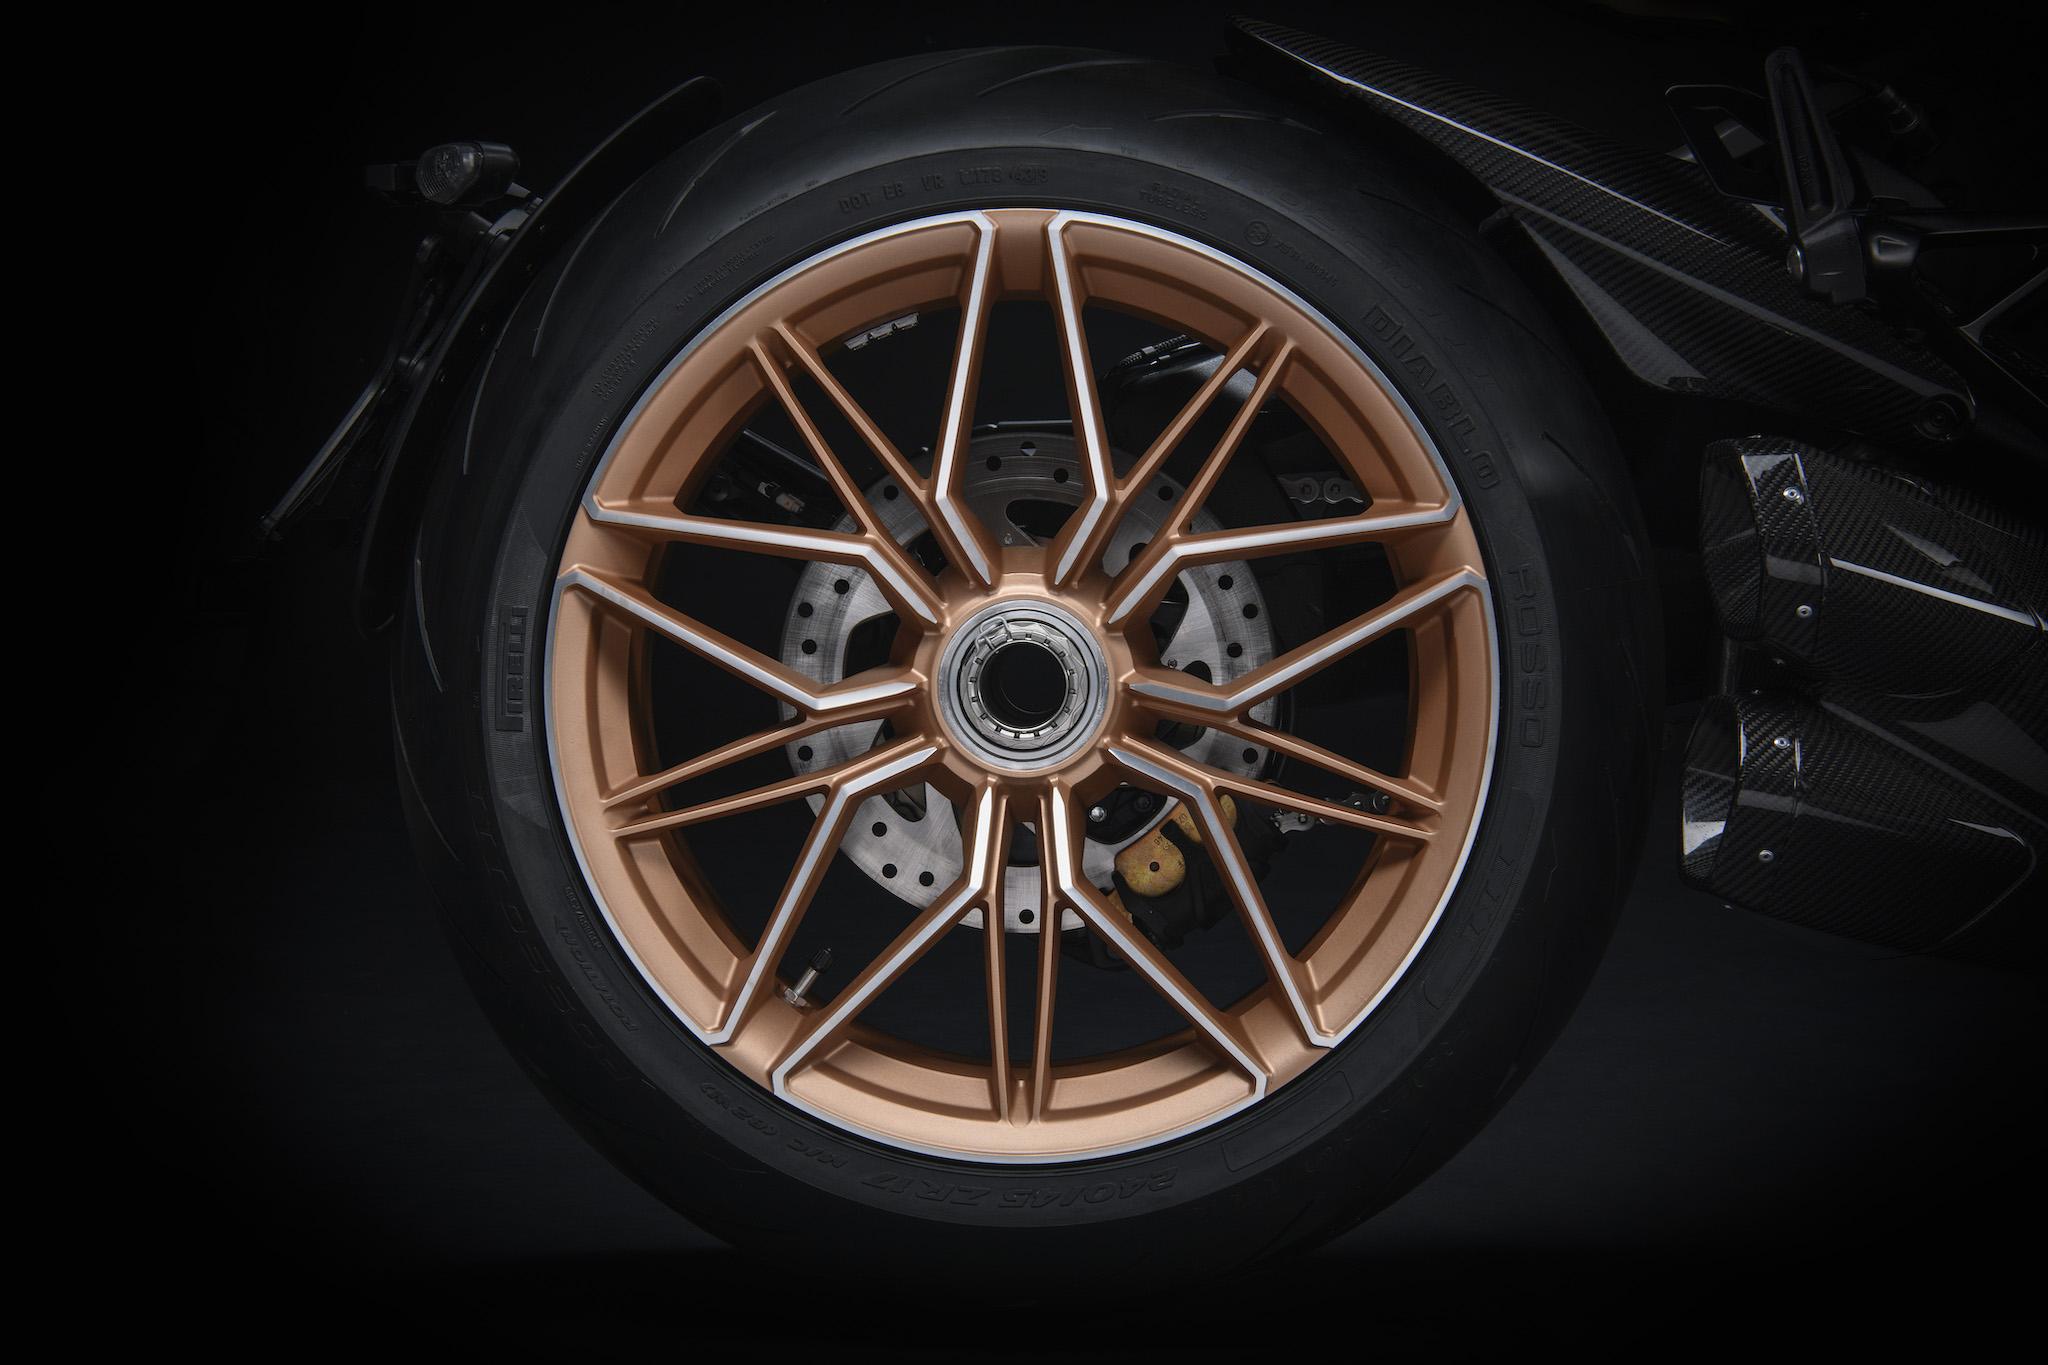 Diavel 1260 roue